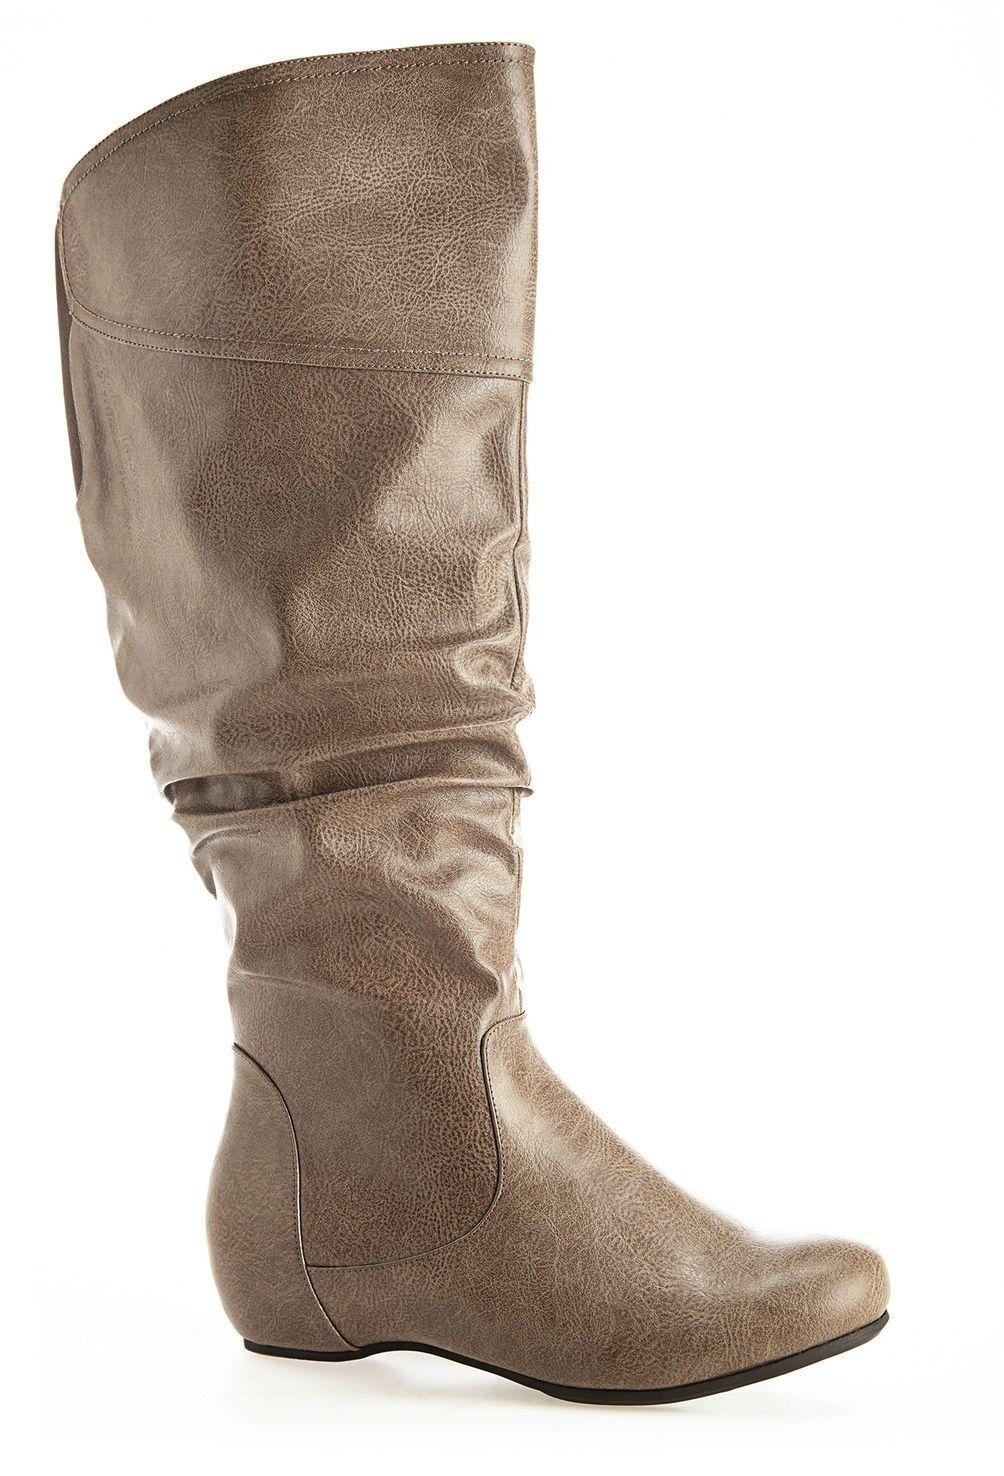 Almere Taupe Tall Ruched Stiefel - Größe 8W